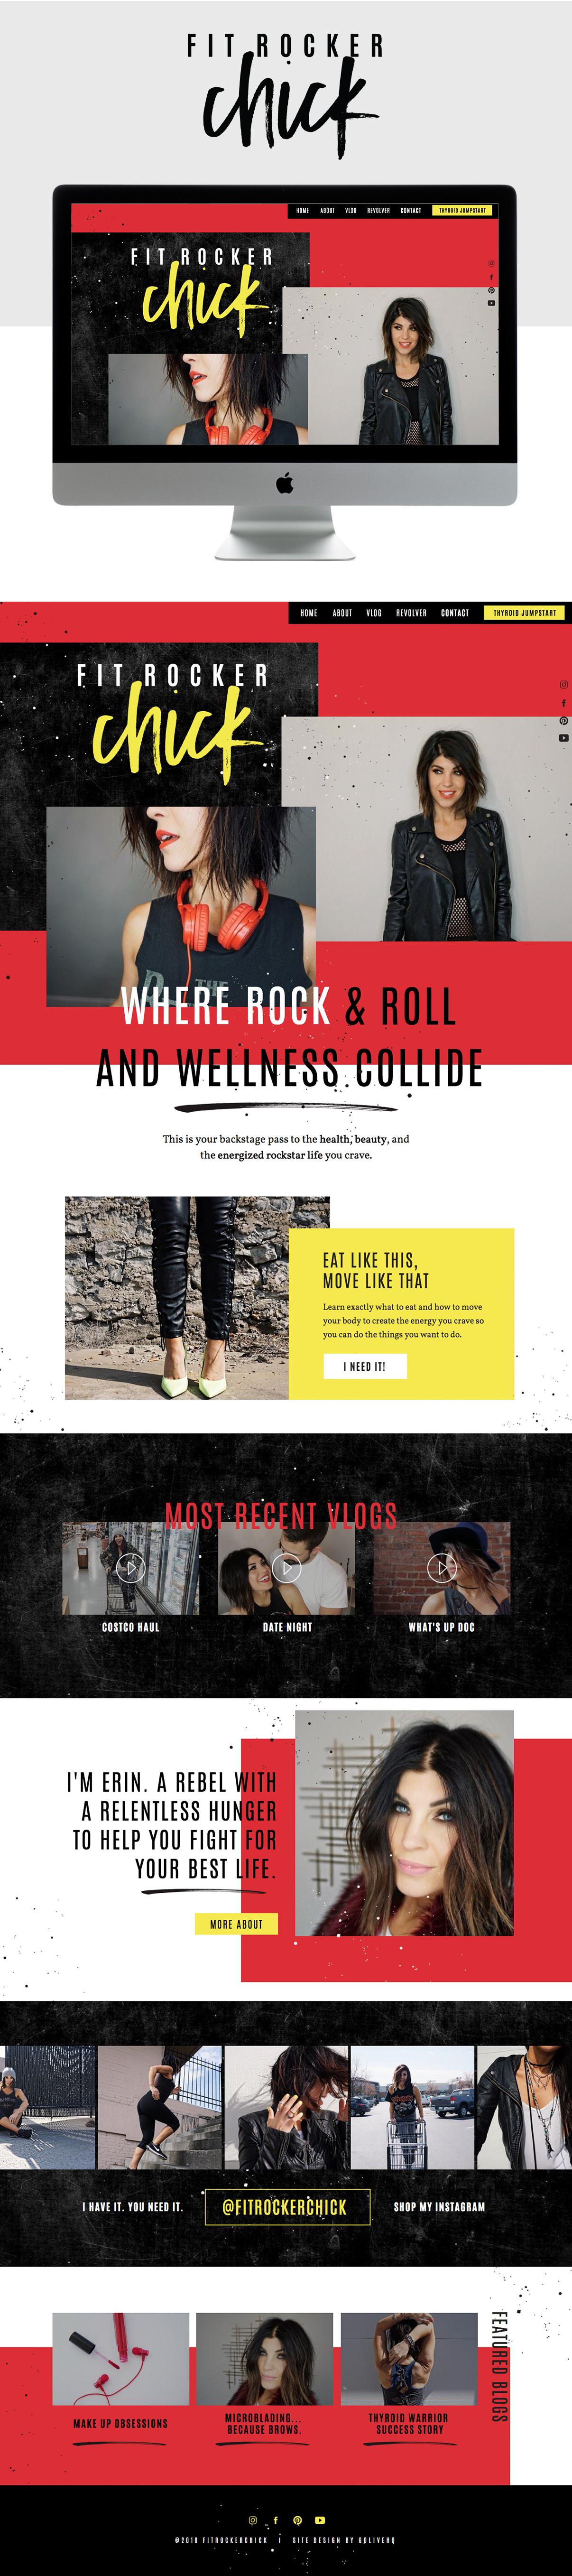 Bold, Modern Website Design for Health and Wellness Blog | Design by Go Live HQ